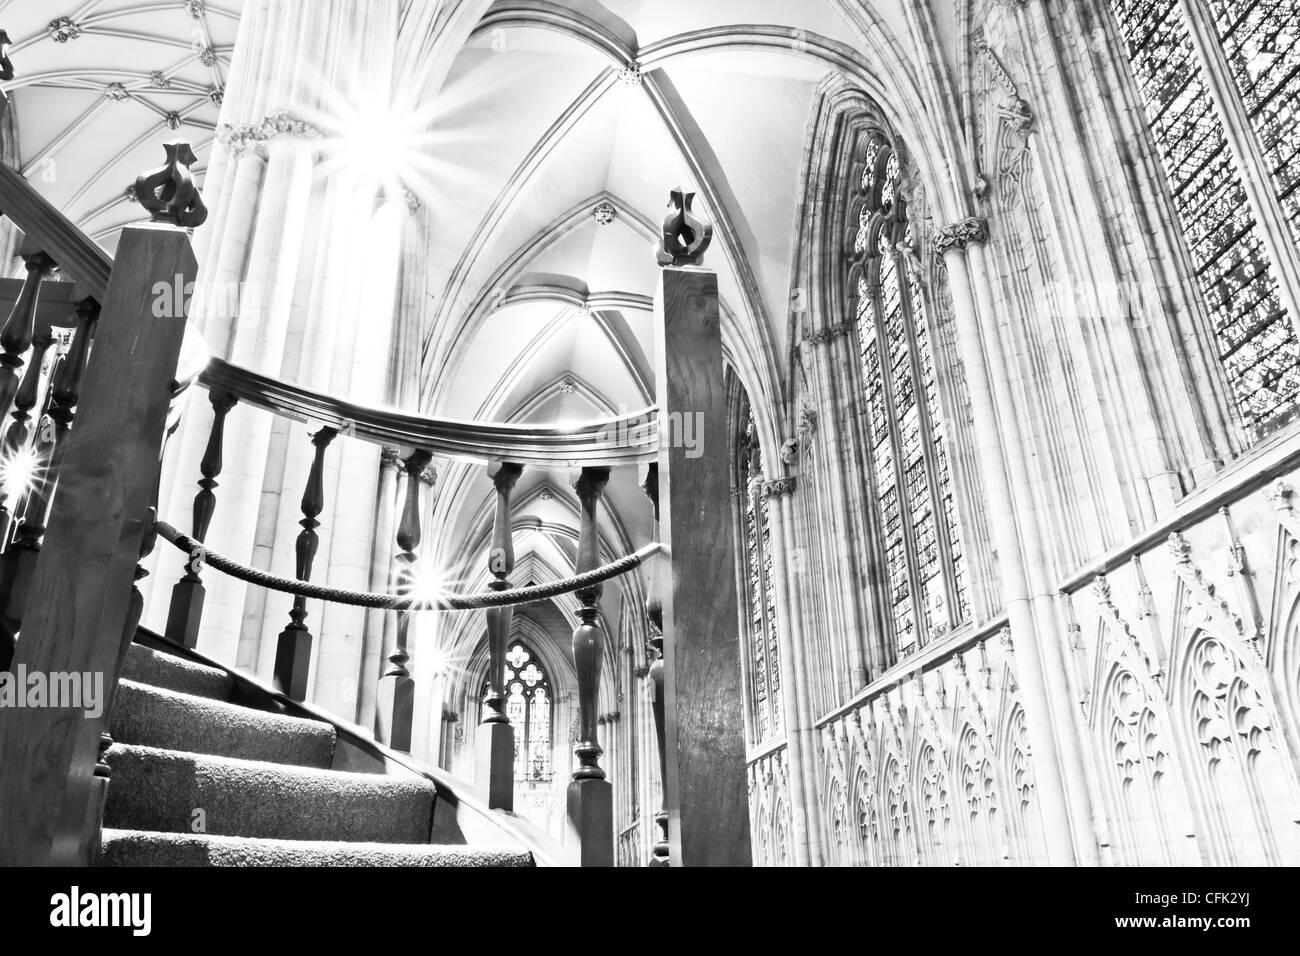 York Minster; Stairway to Heaven - Stock Image